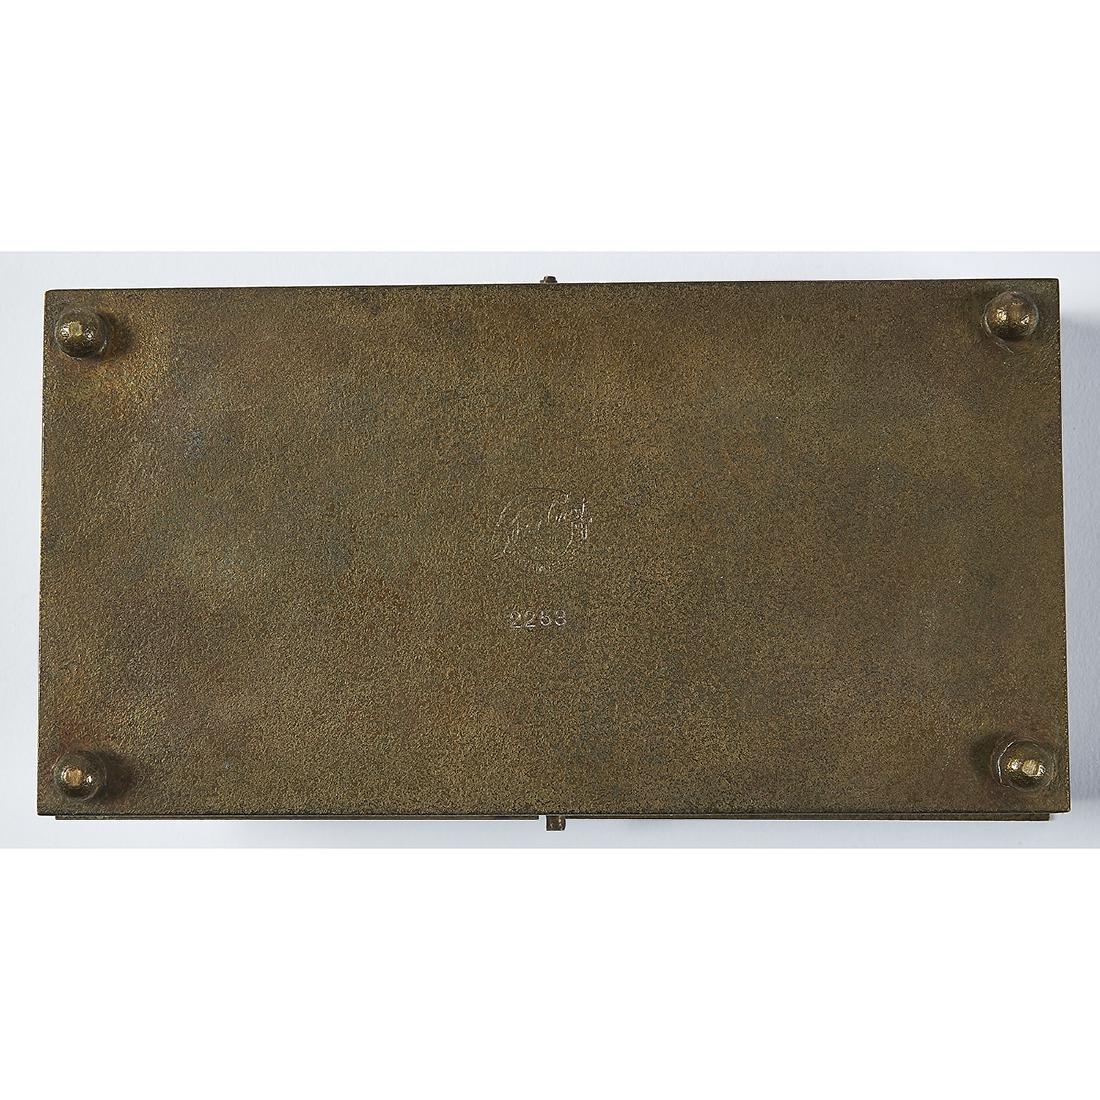 Smith Metal Arts Co. Silver Crest line desk set - 7